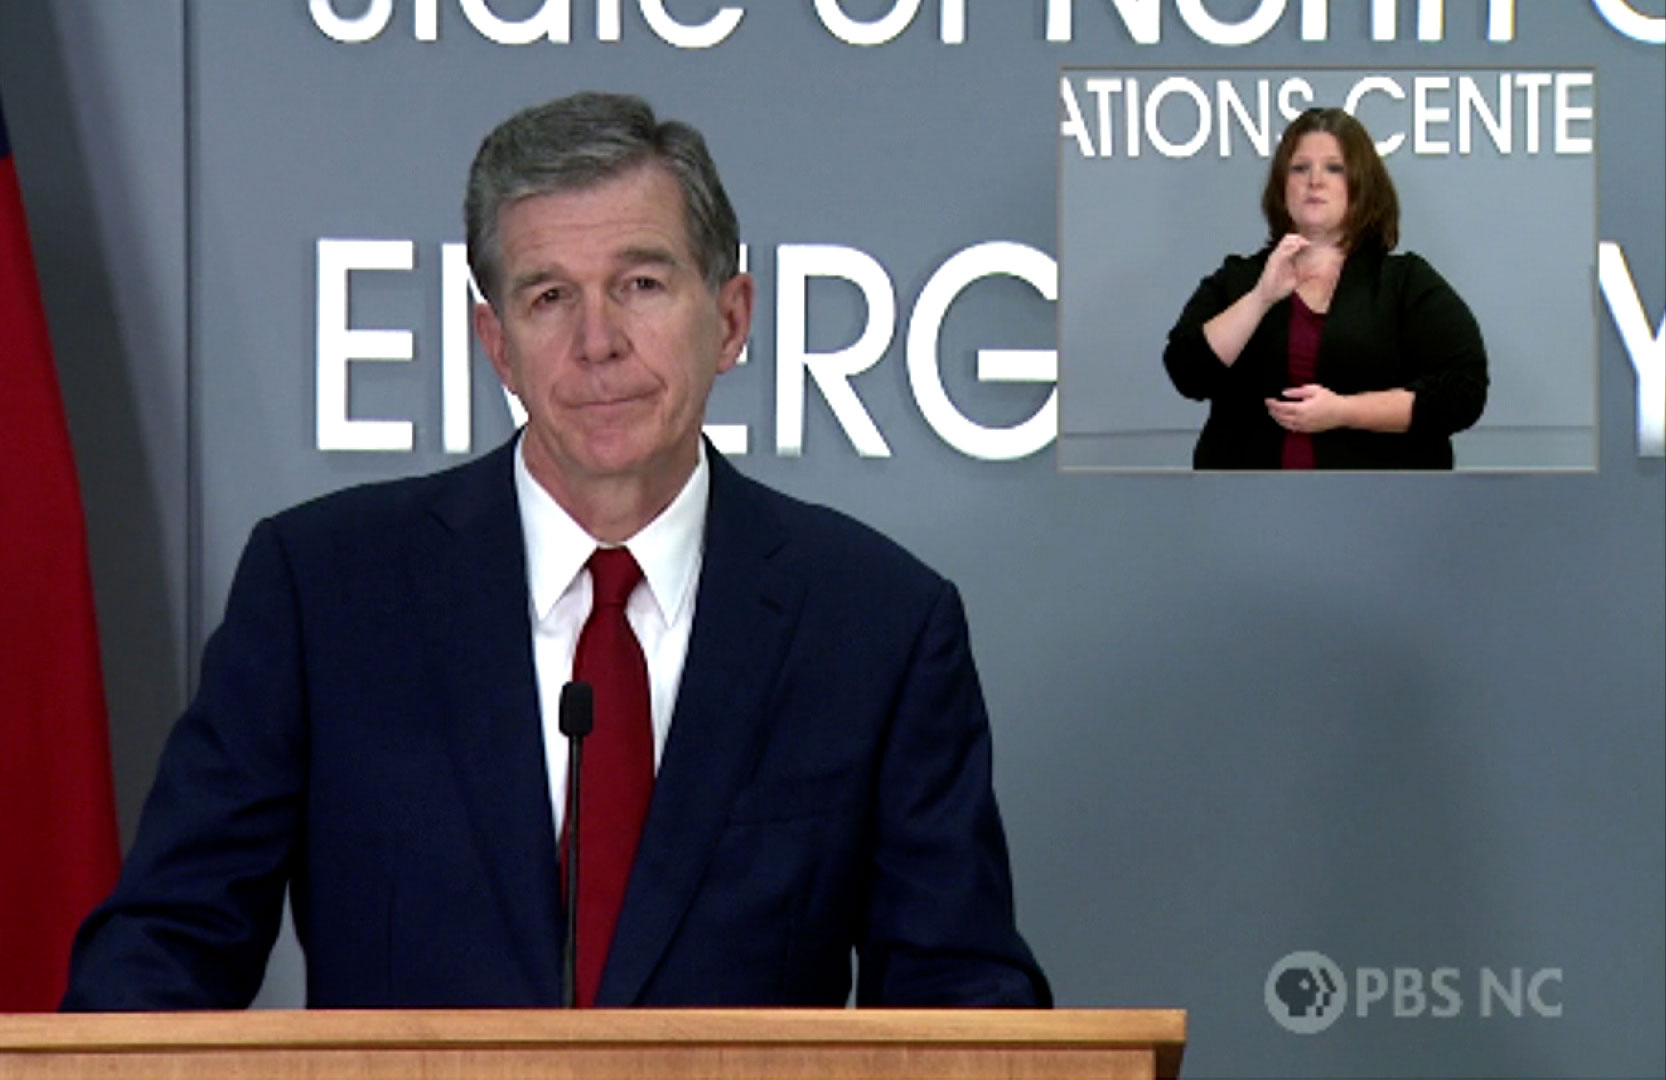 Gov. Roy Cooper speaks at a press conference in Raleigh, North Carolina, on September 9.